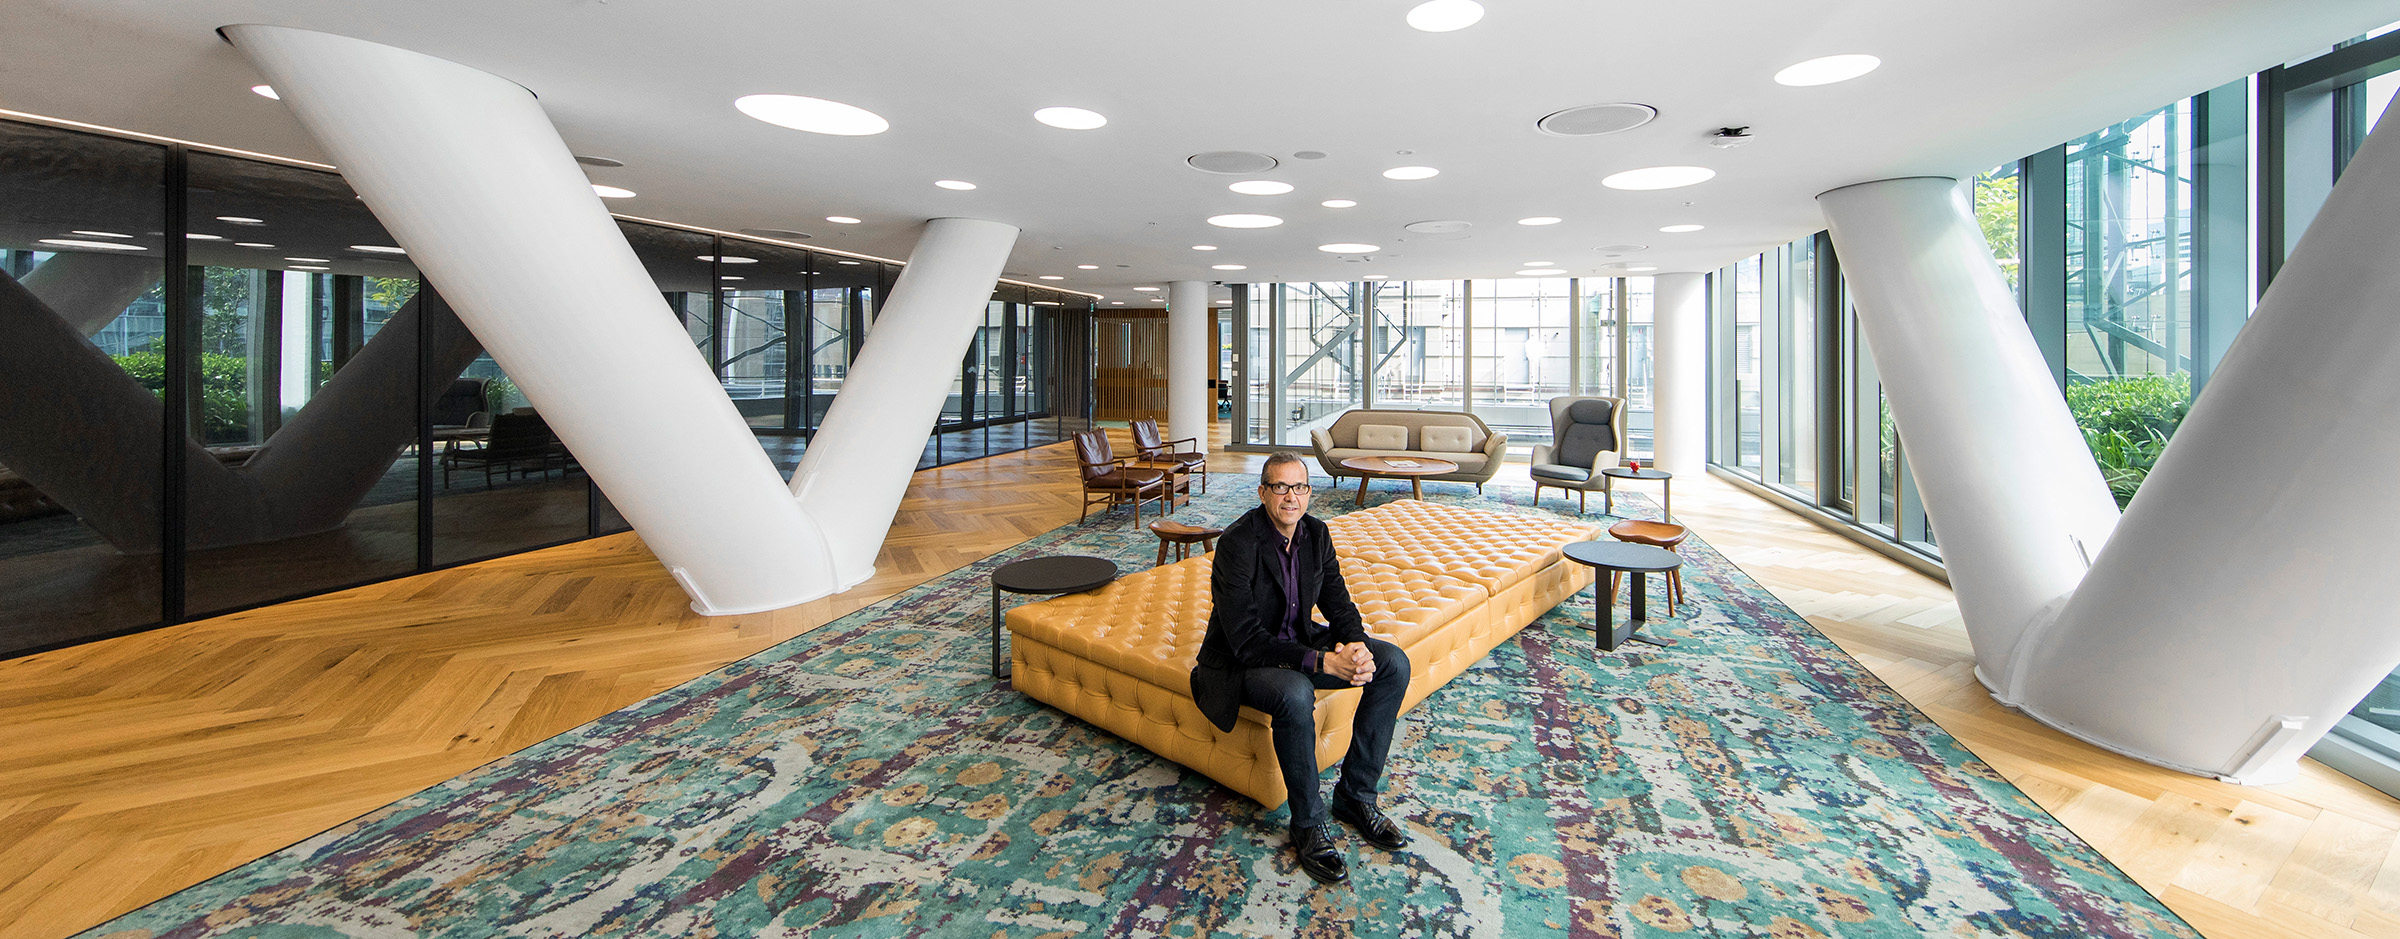 Editorial location photography for Engineers Australia of Tony Lavarto sitting in Ashurst reception Sydney